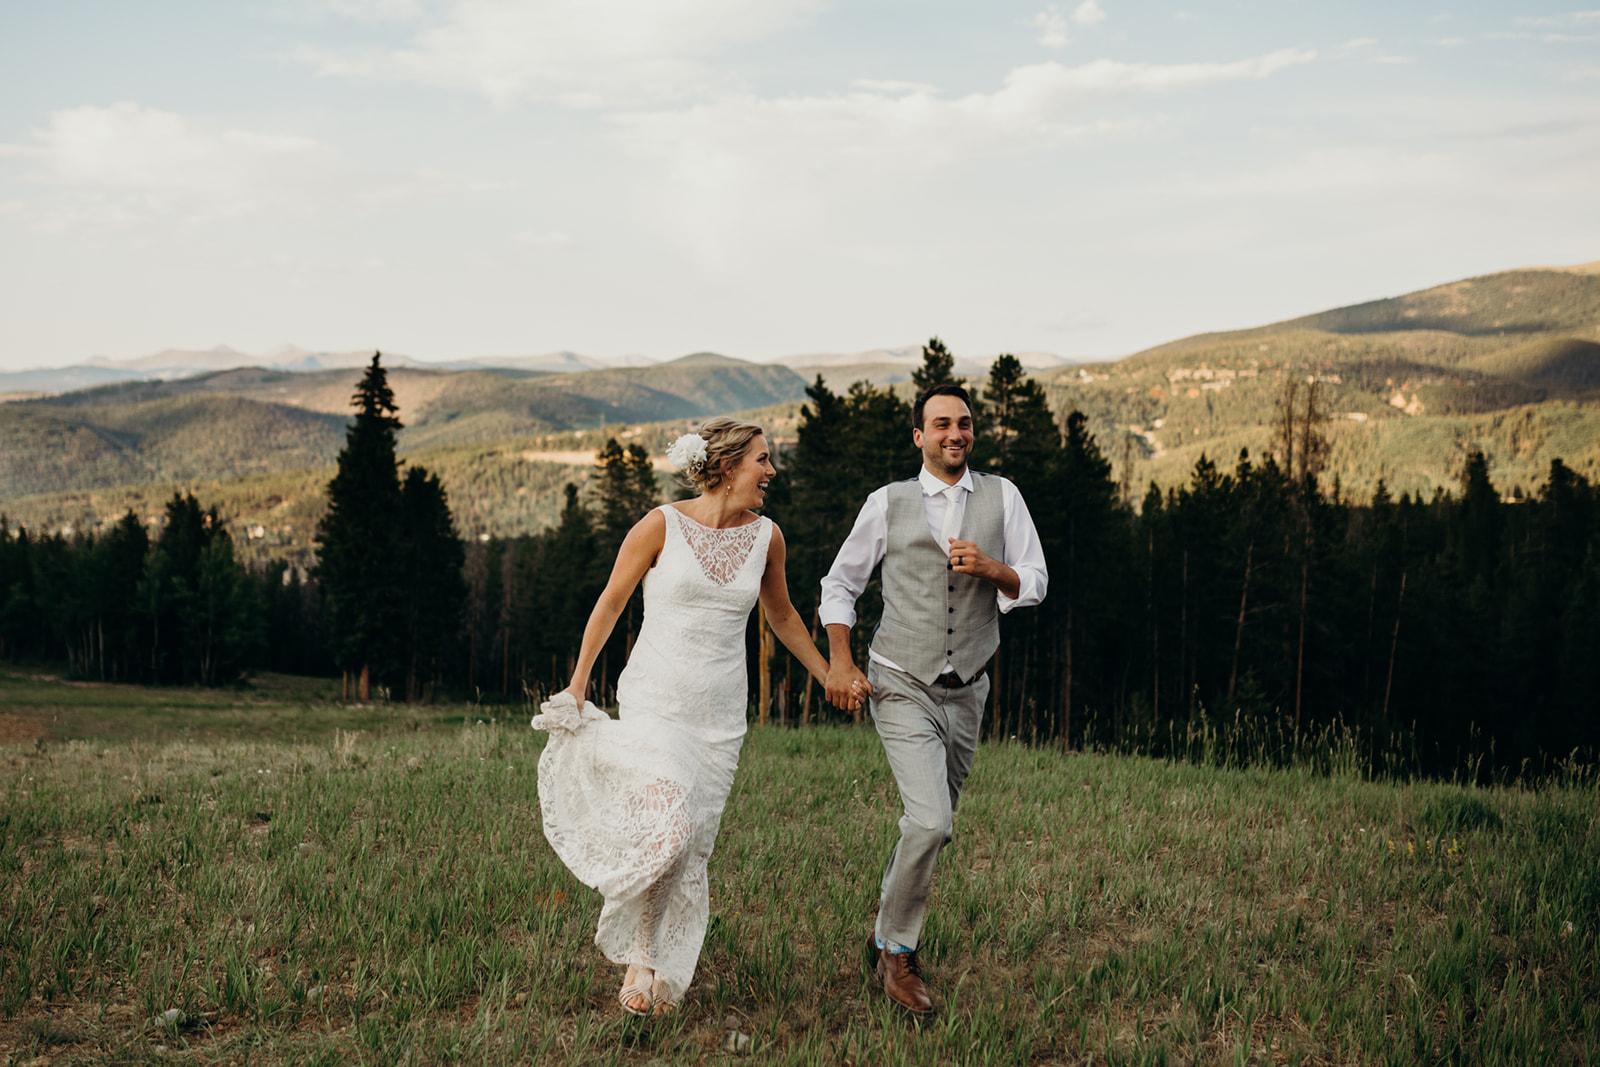 ten-mile-stadium-breckenridge-wedding-photographer-145.jpg